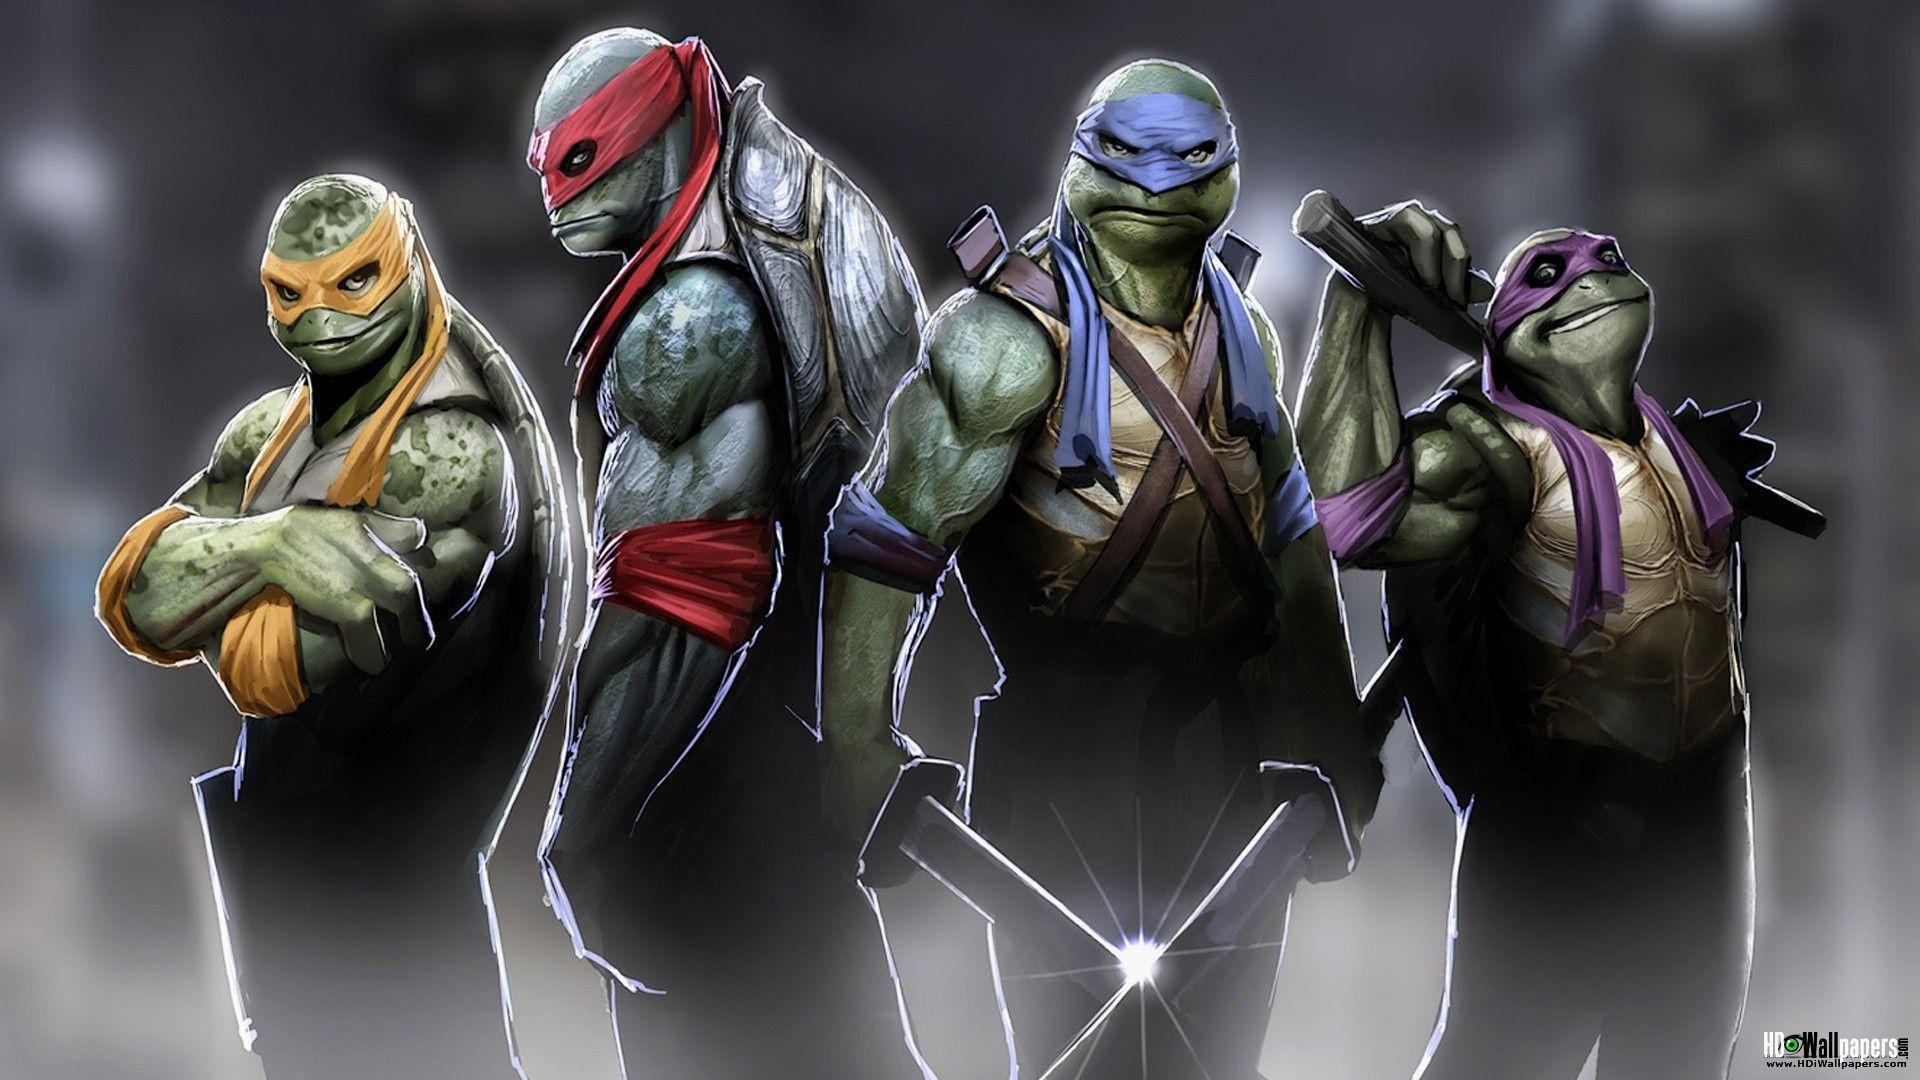 Teenage Mutant Ninja Turtles Wallpapers Wallpaper Cave